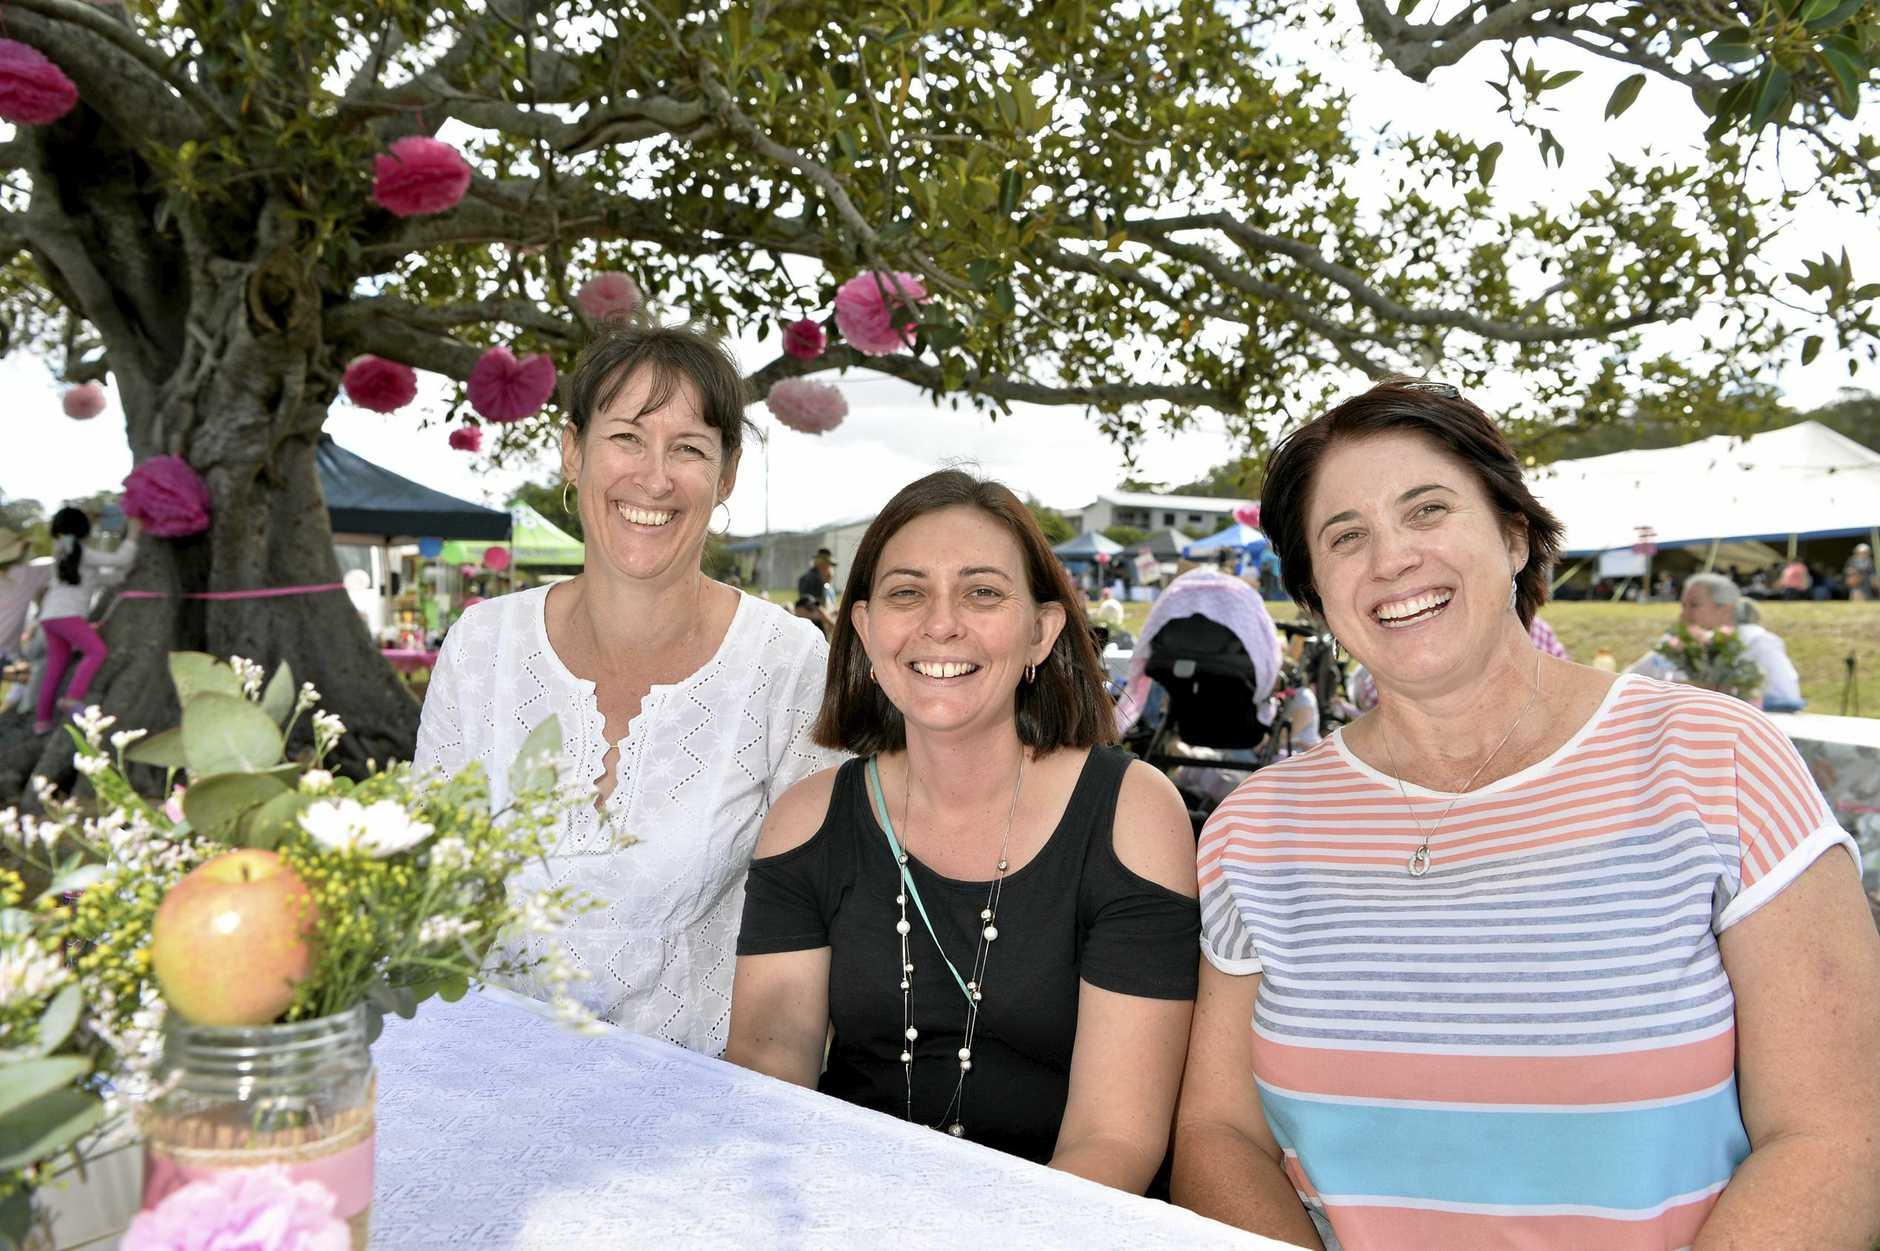 Having a great time are (from left) Bronwyn Logan, Leesa Van Zandbergen and Prue Fellowes.